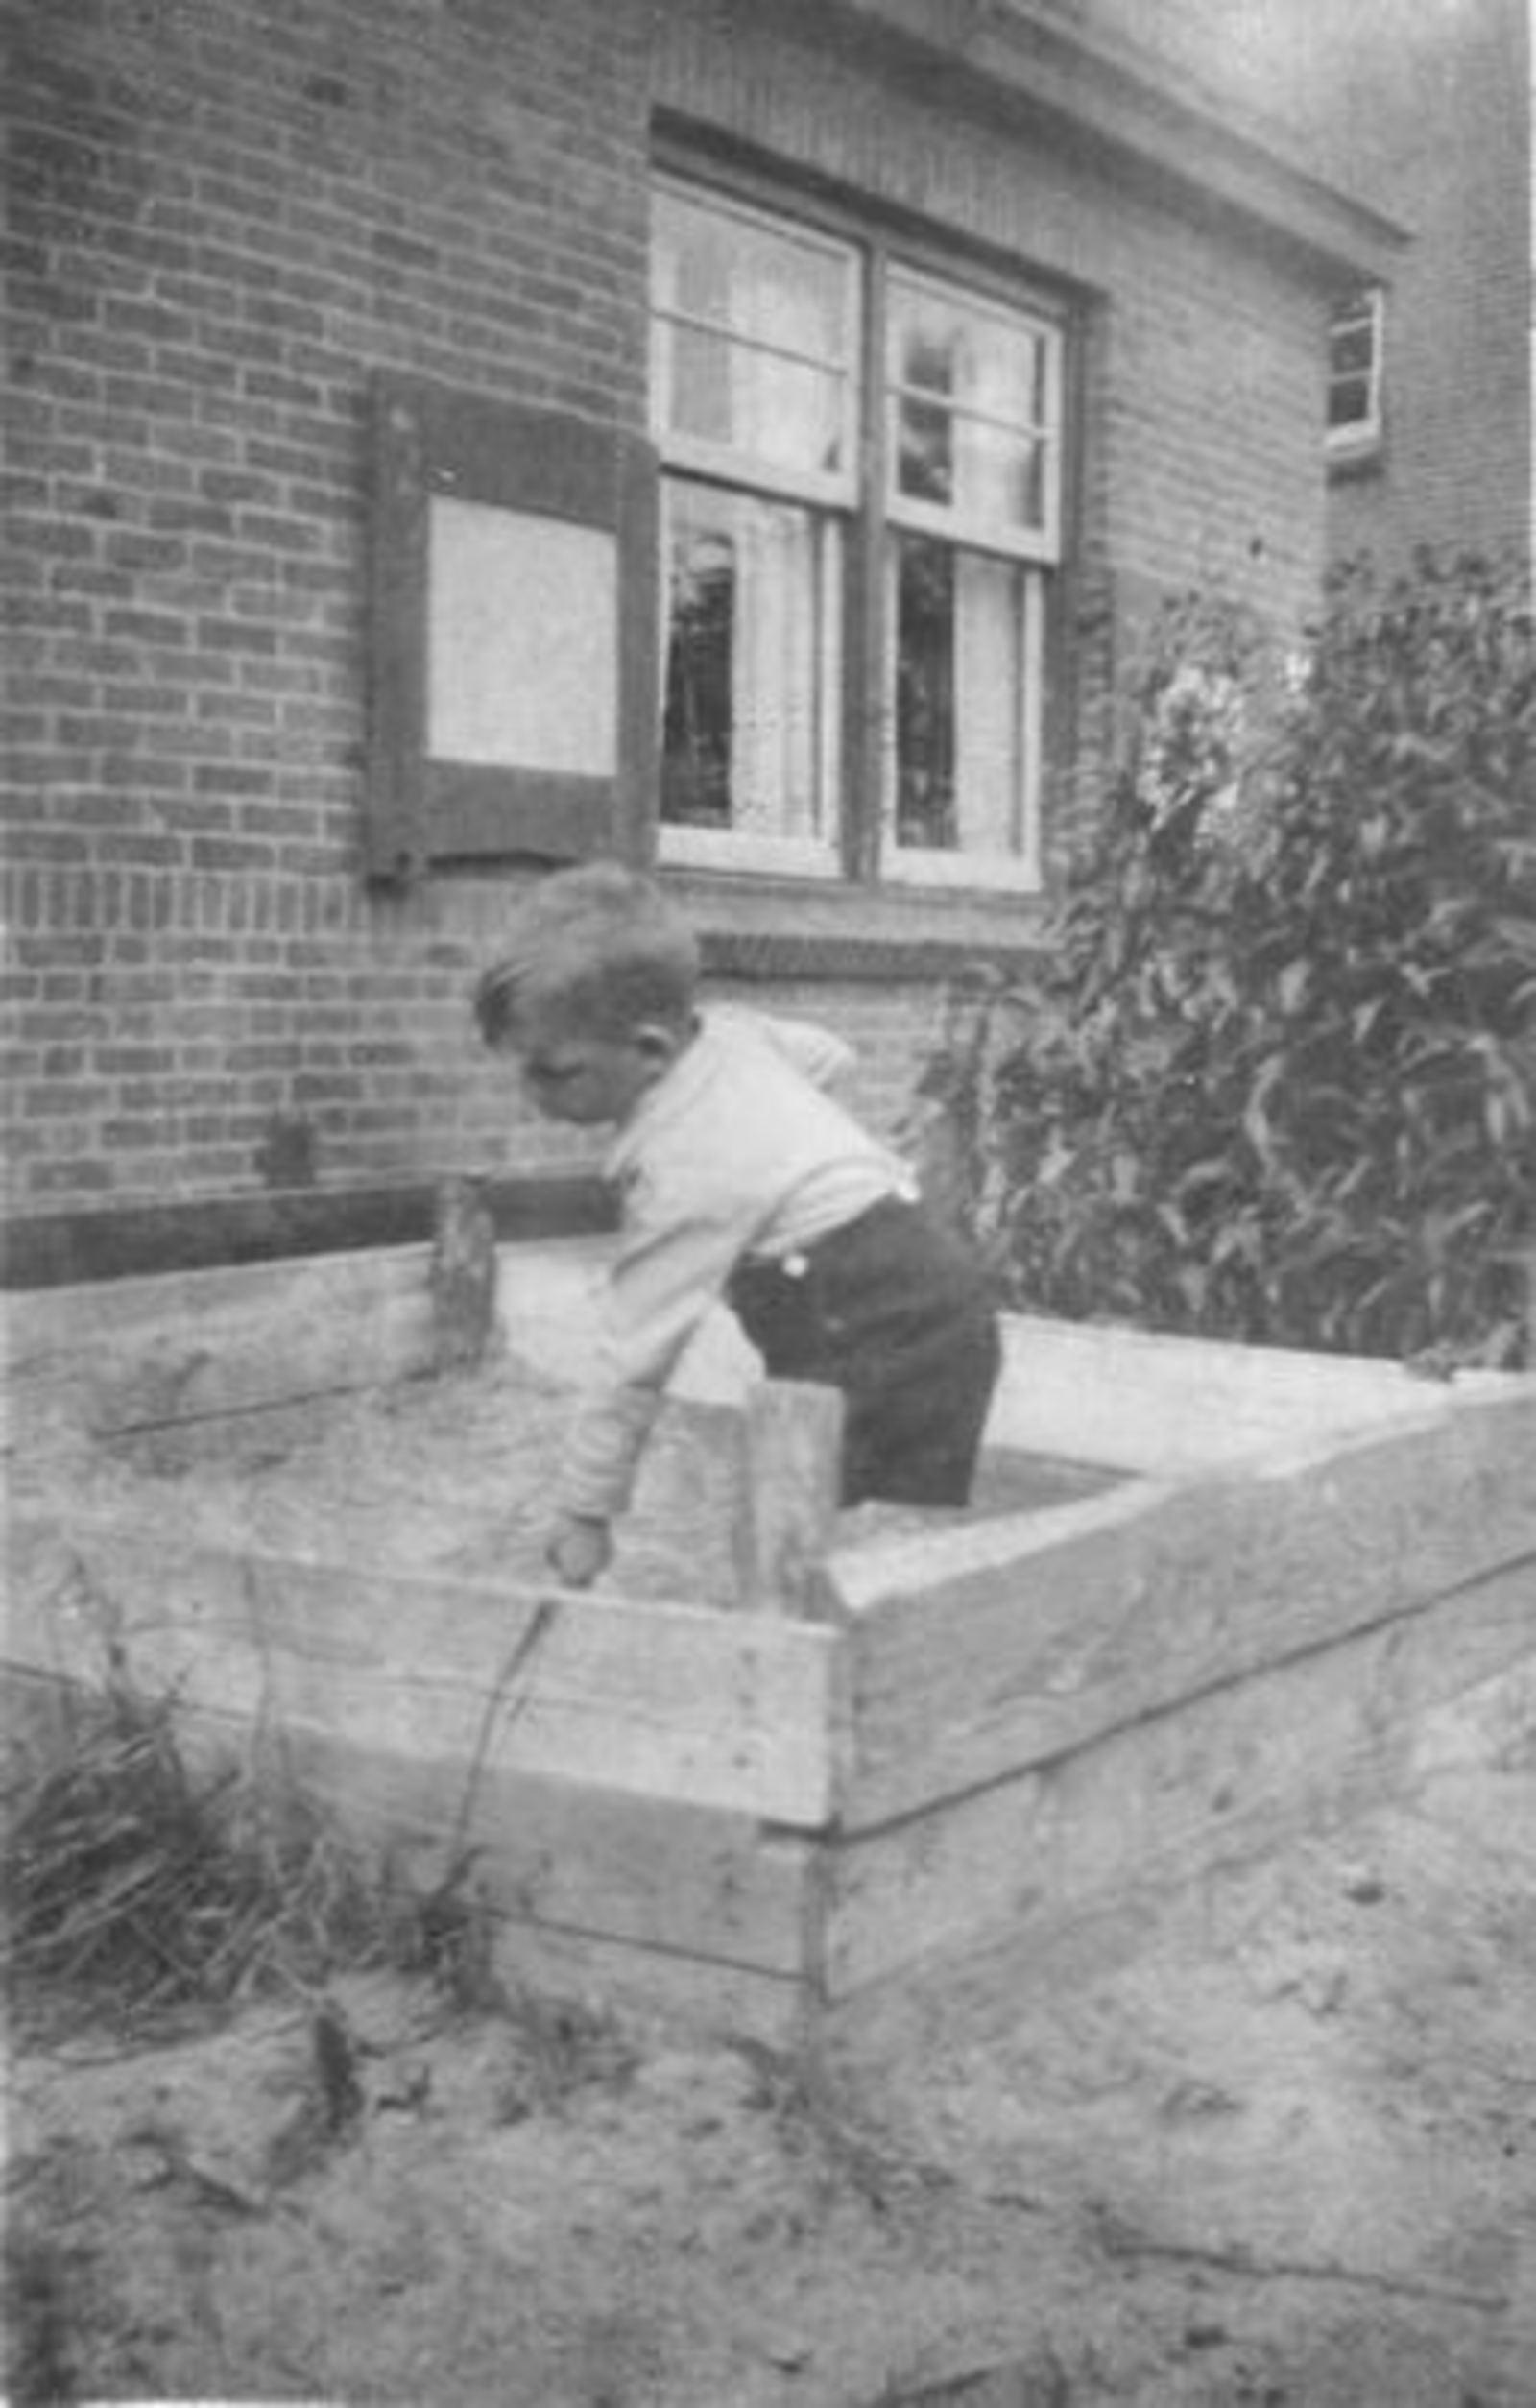 Fortweg W 0039 1944± Huize Koolbergen met Kinderen in Zandbak 03